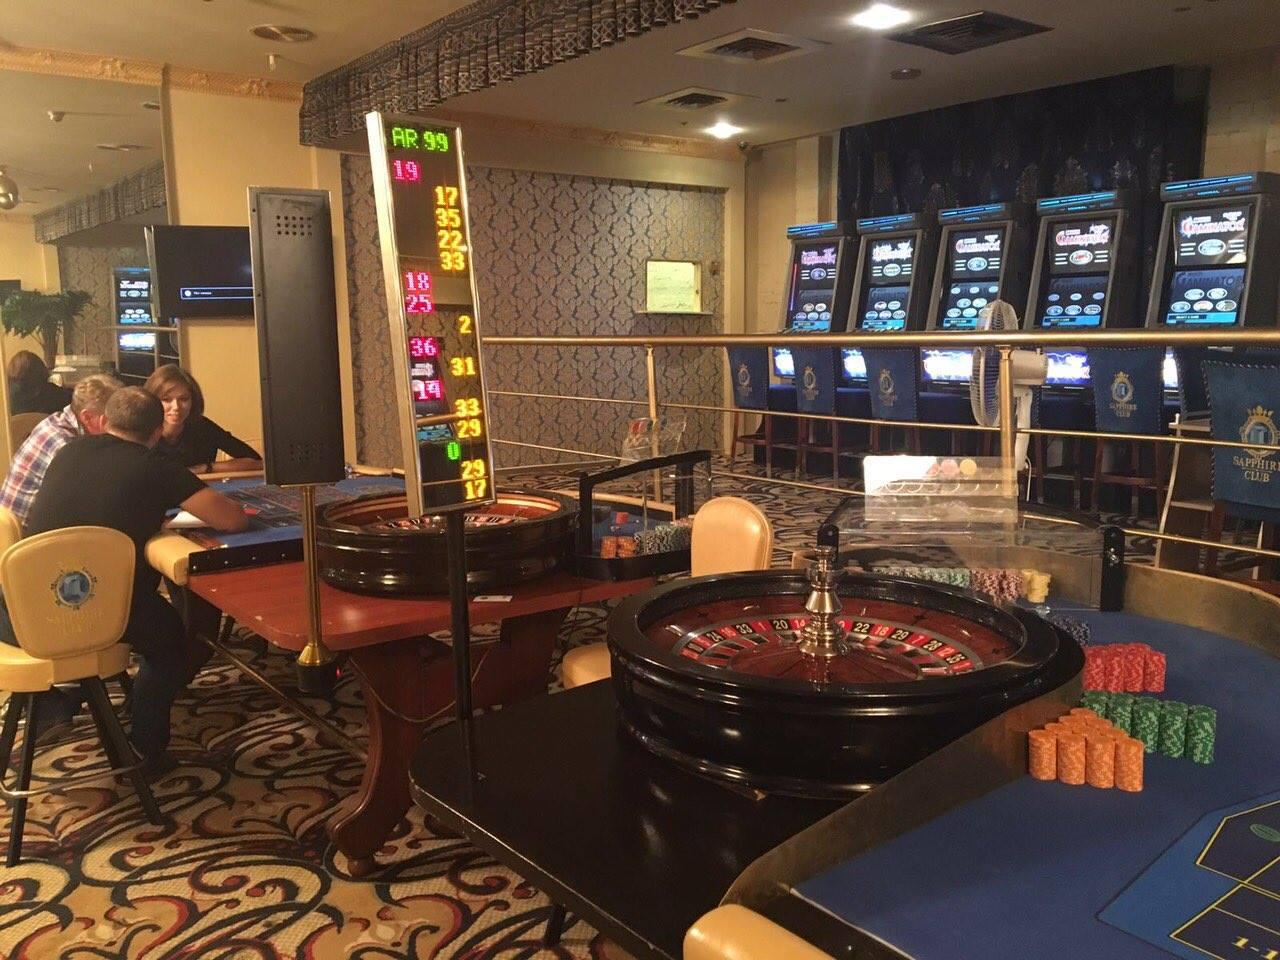 ВКиеве водном изТРЦ разоблачили подпольное VIP-казино